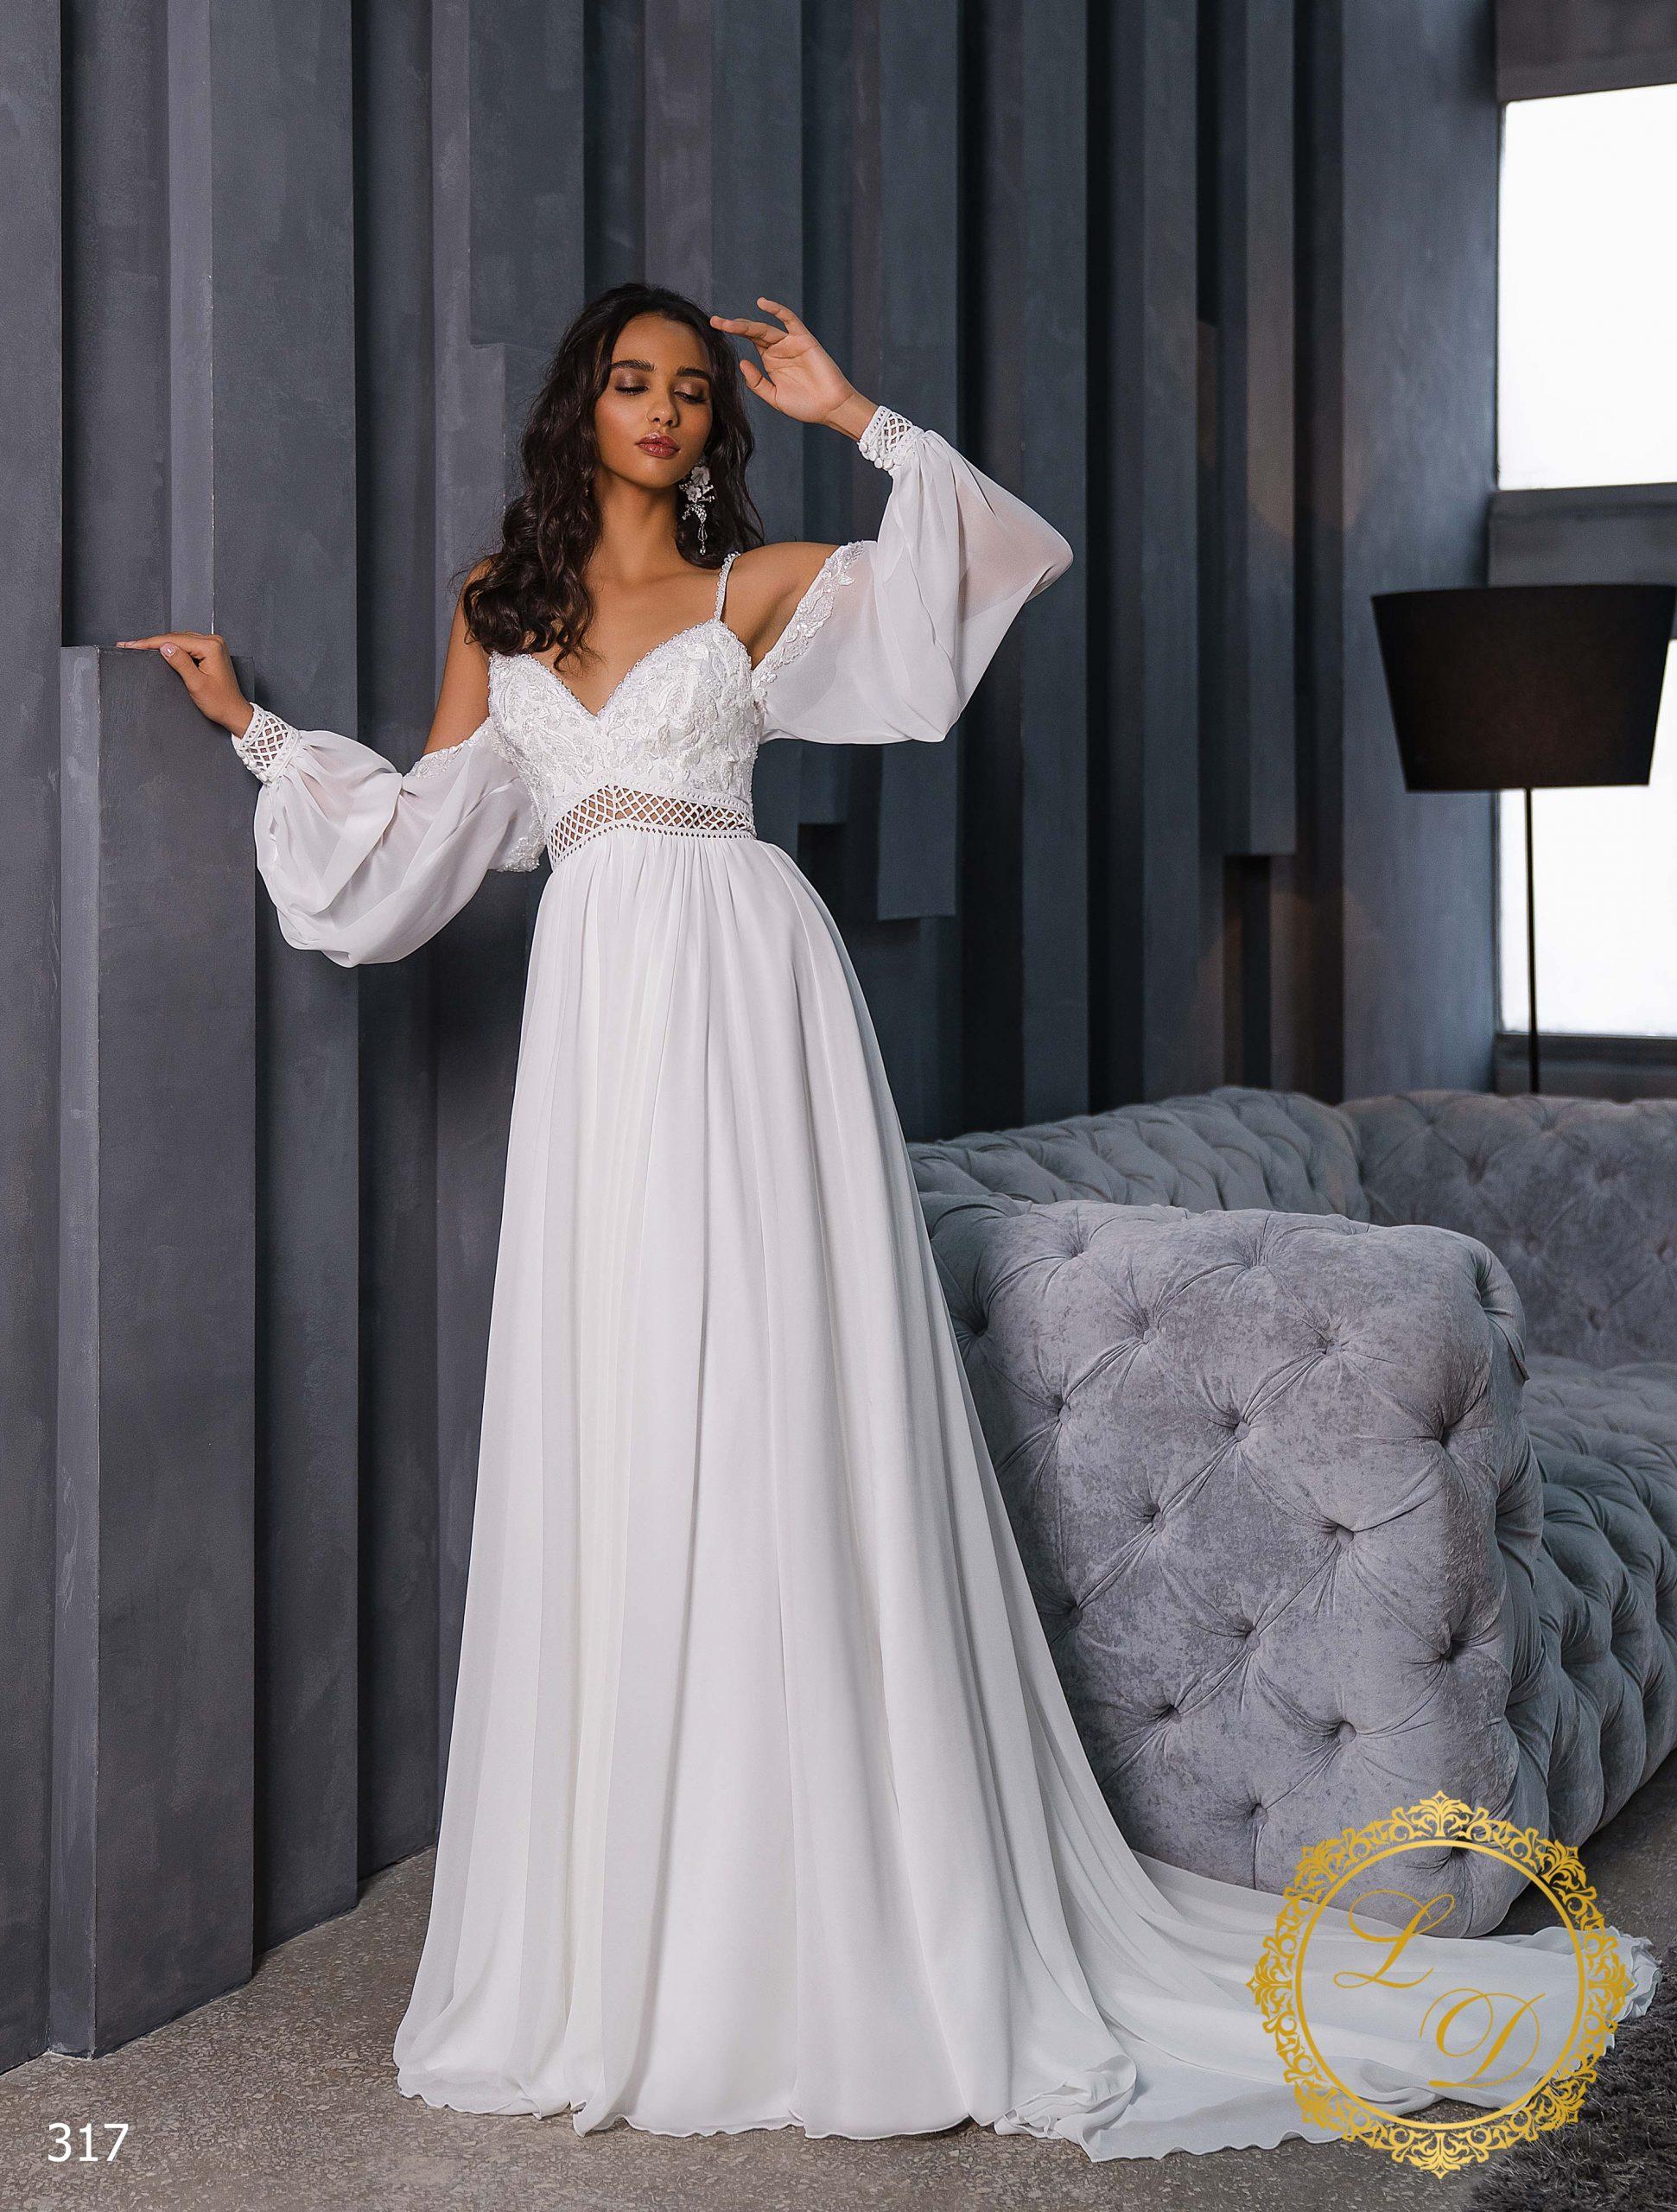 Wedding Dress Lady Di 317-1